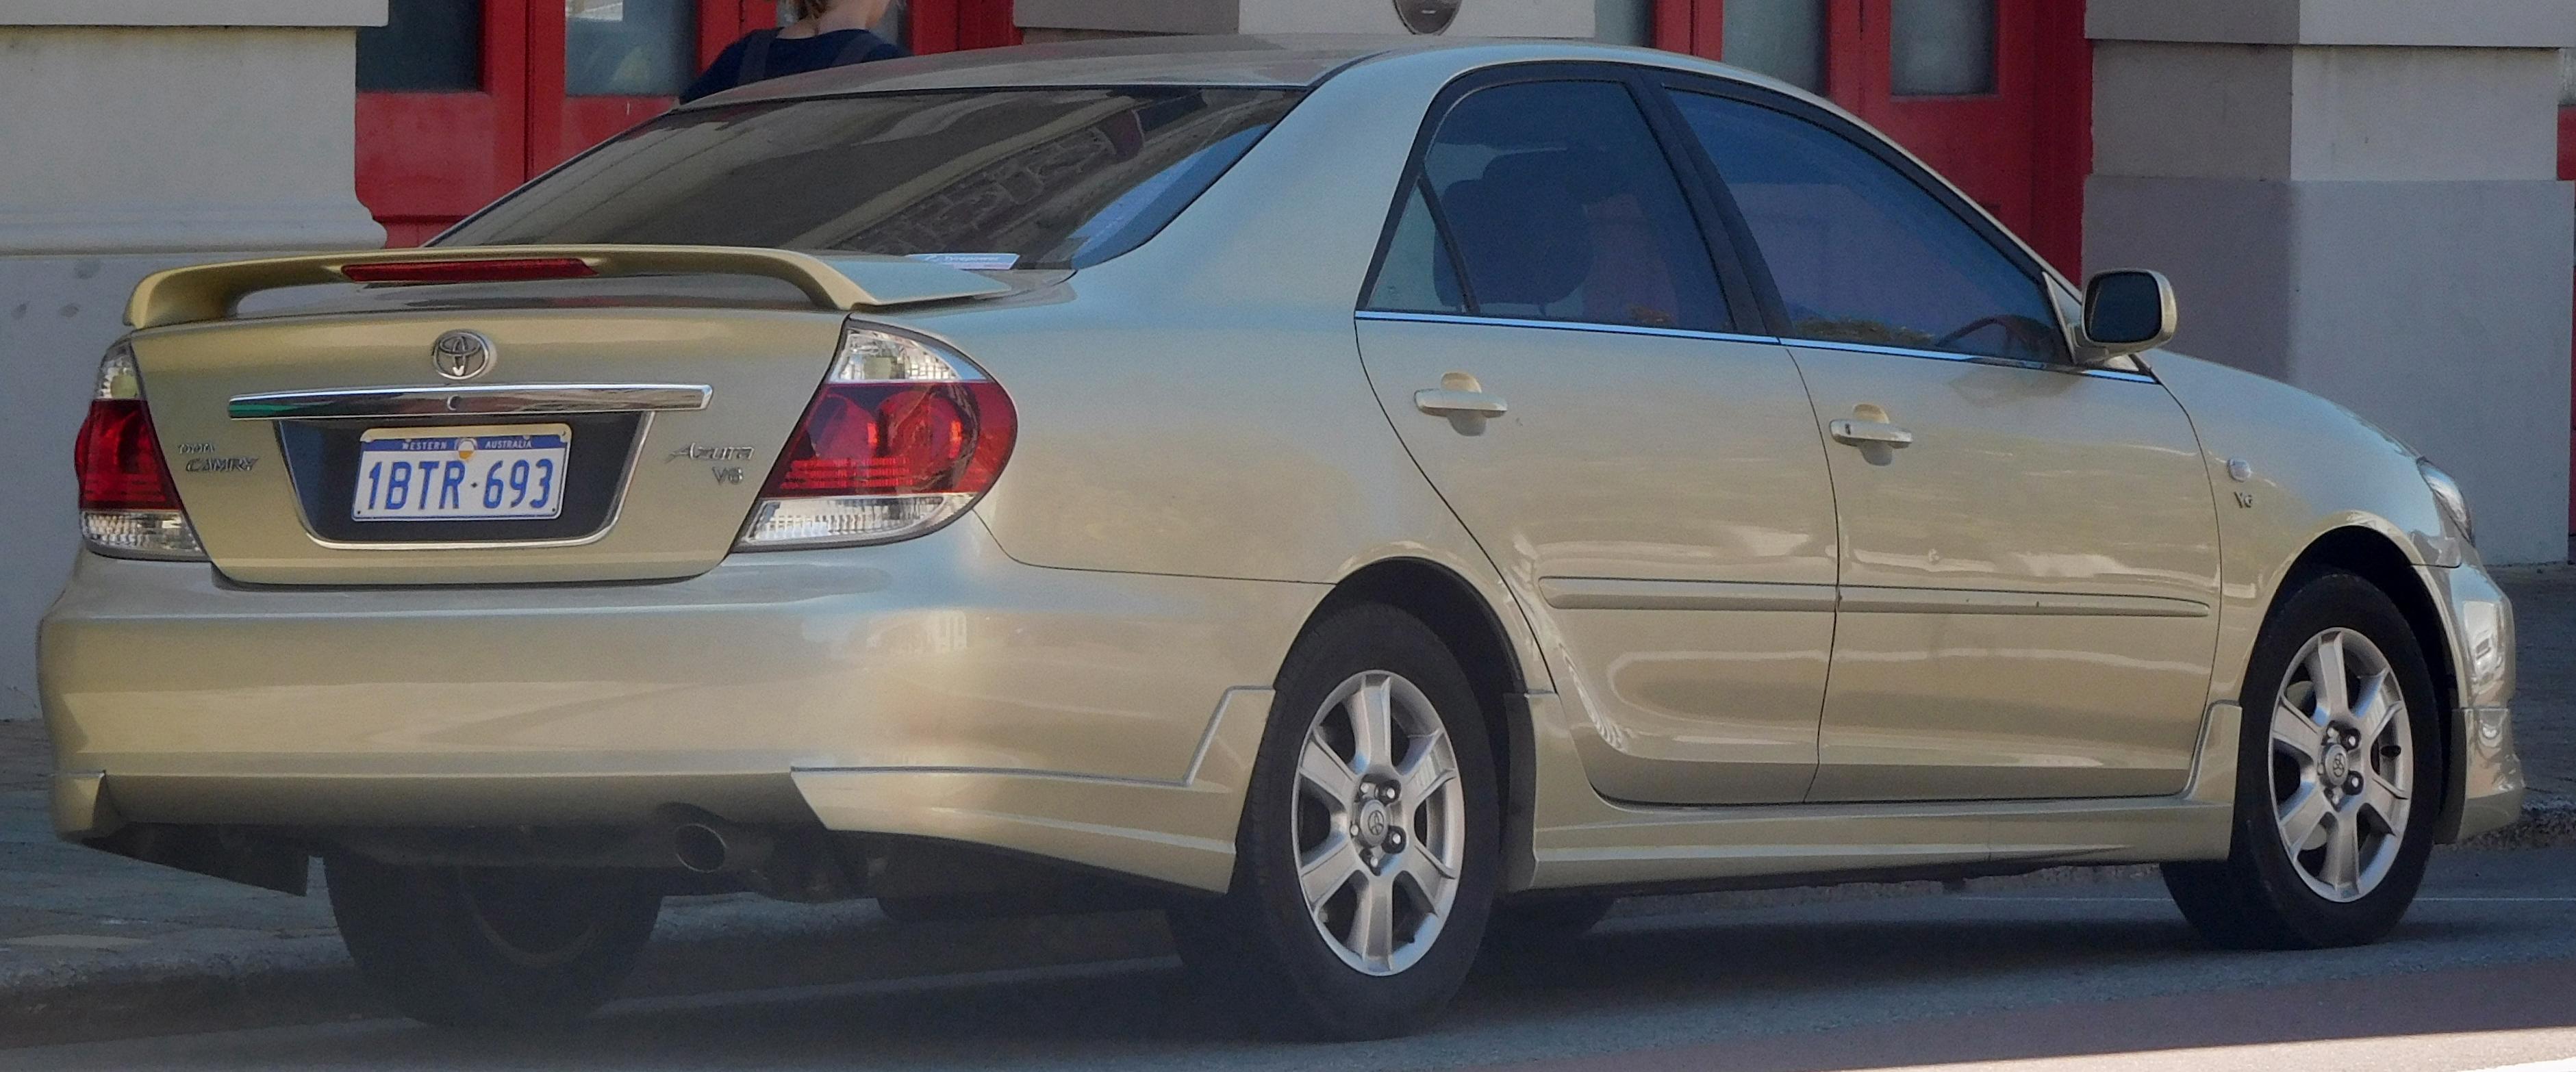 File 2004 2006 Toyota Camry Mcv36r Azura V6 Sedan 2018